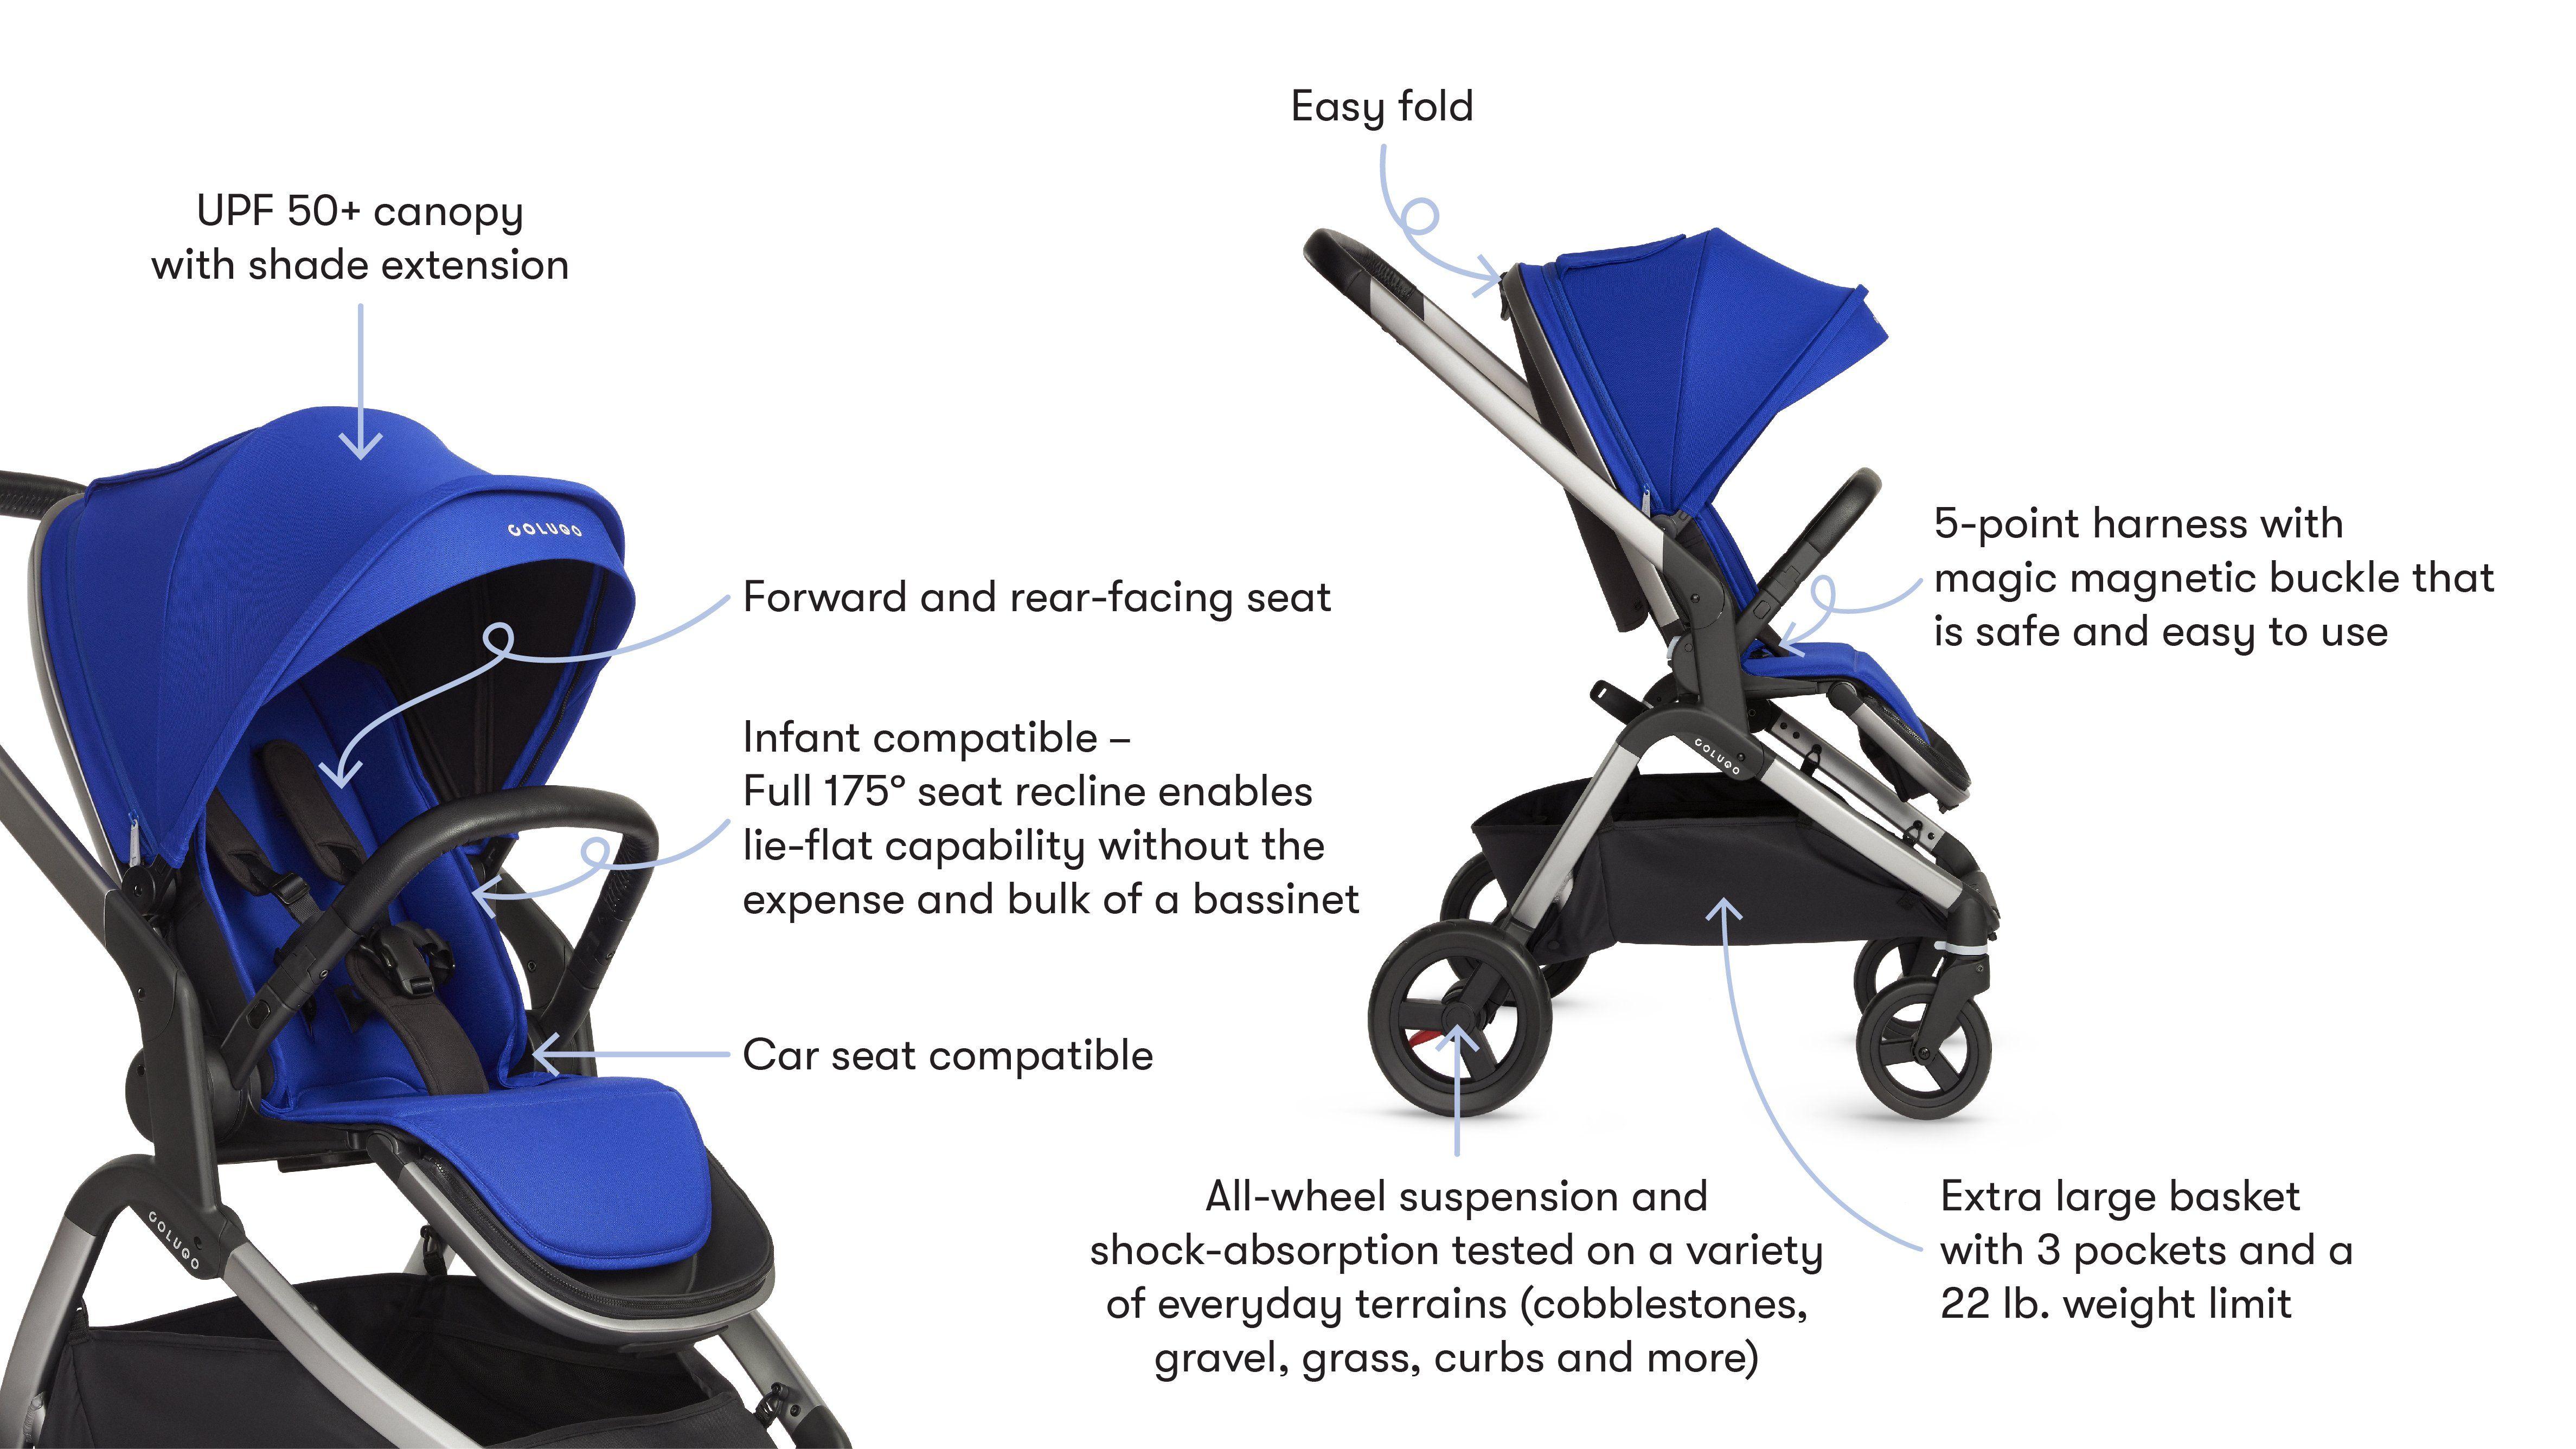 The Complete Stroller Deep Blue in 2020 Stroller